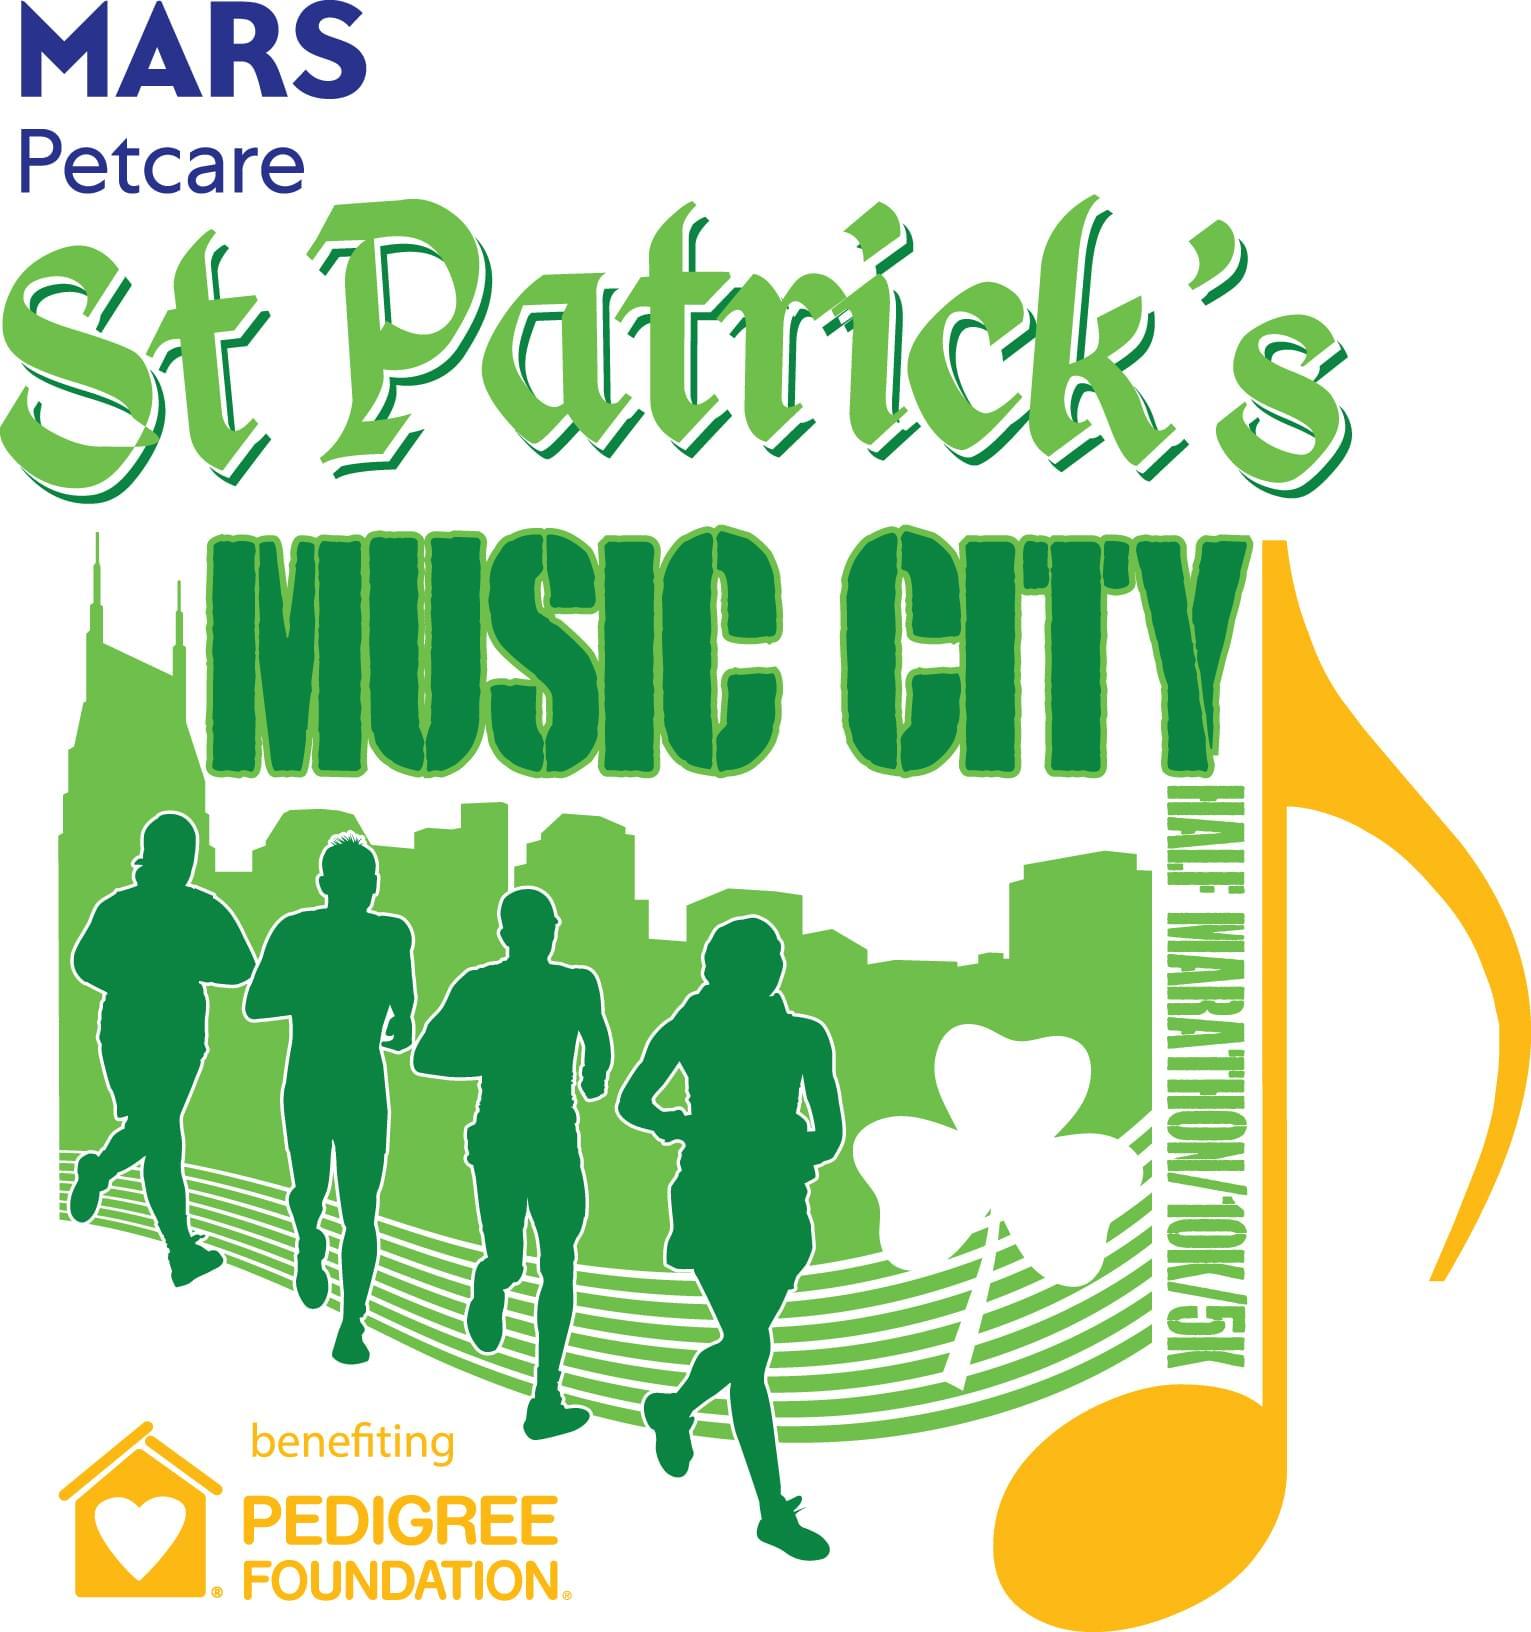 Mars Petcare St. Patrick's Music City Half, 10k, 5k, & 1 Mile